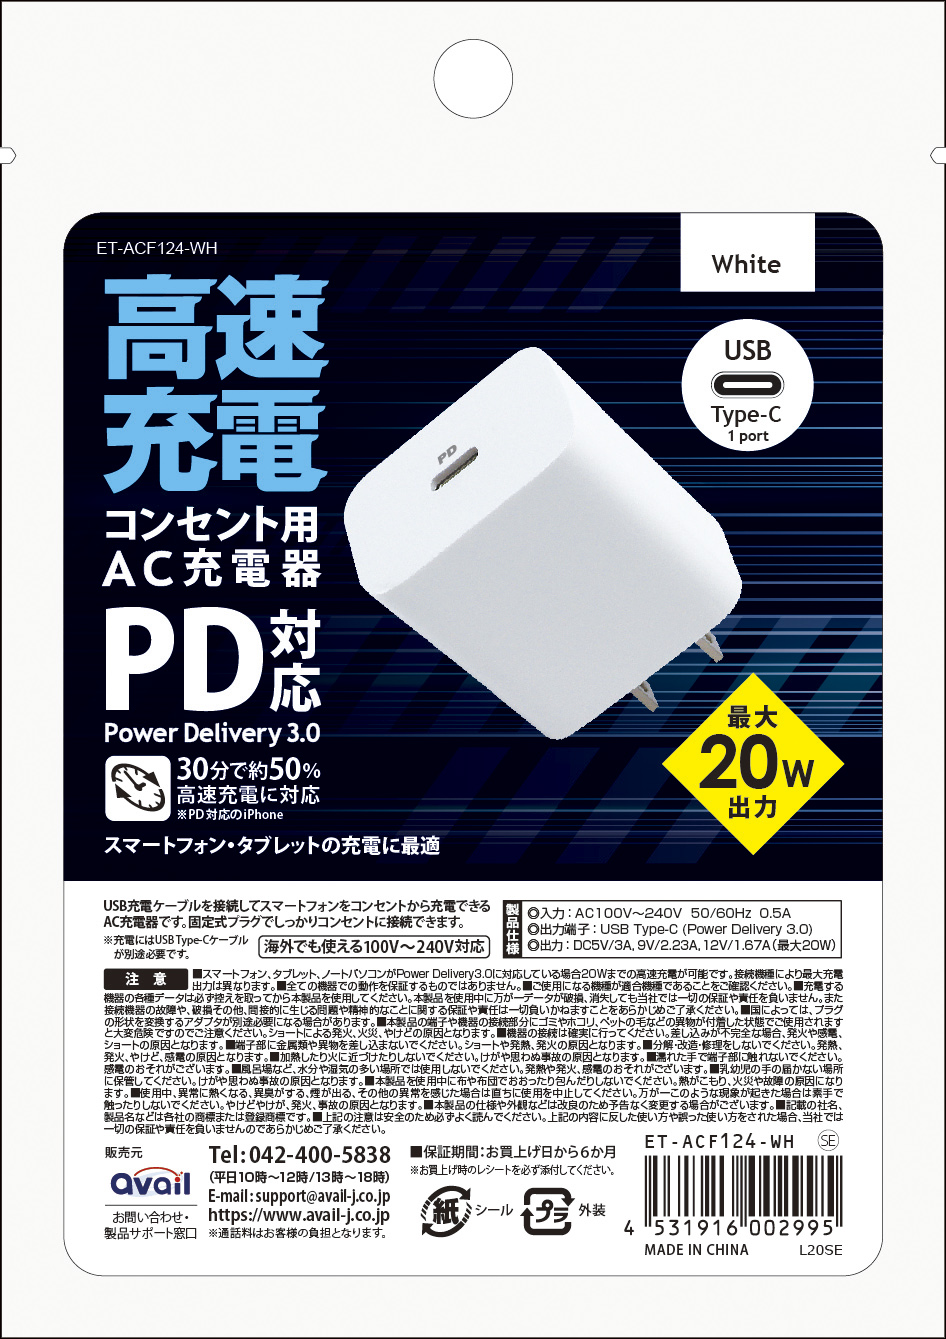 PD Type-C 1ポート AC充電器 20W 固定式プラグ